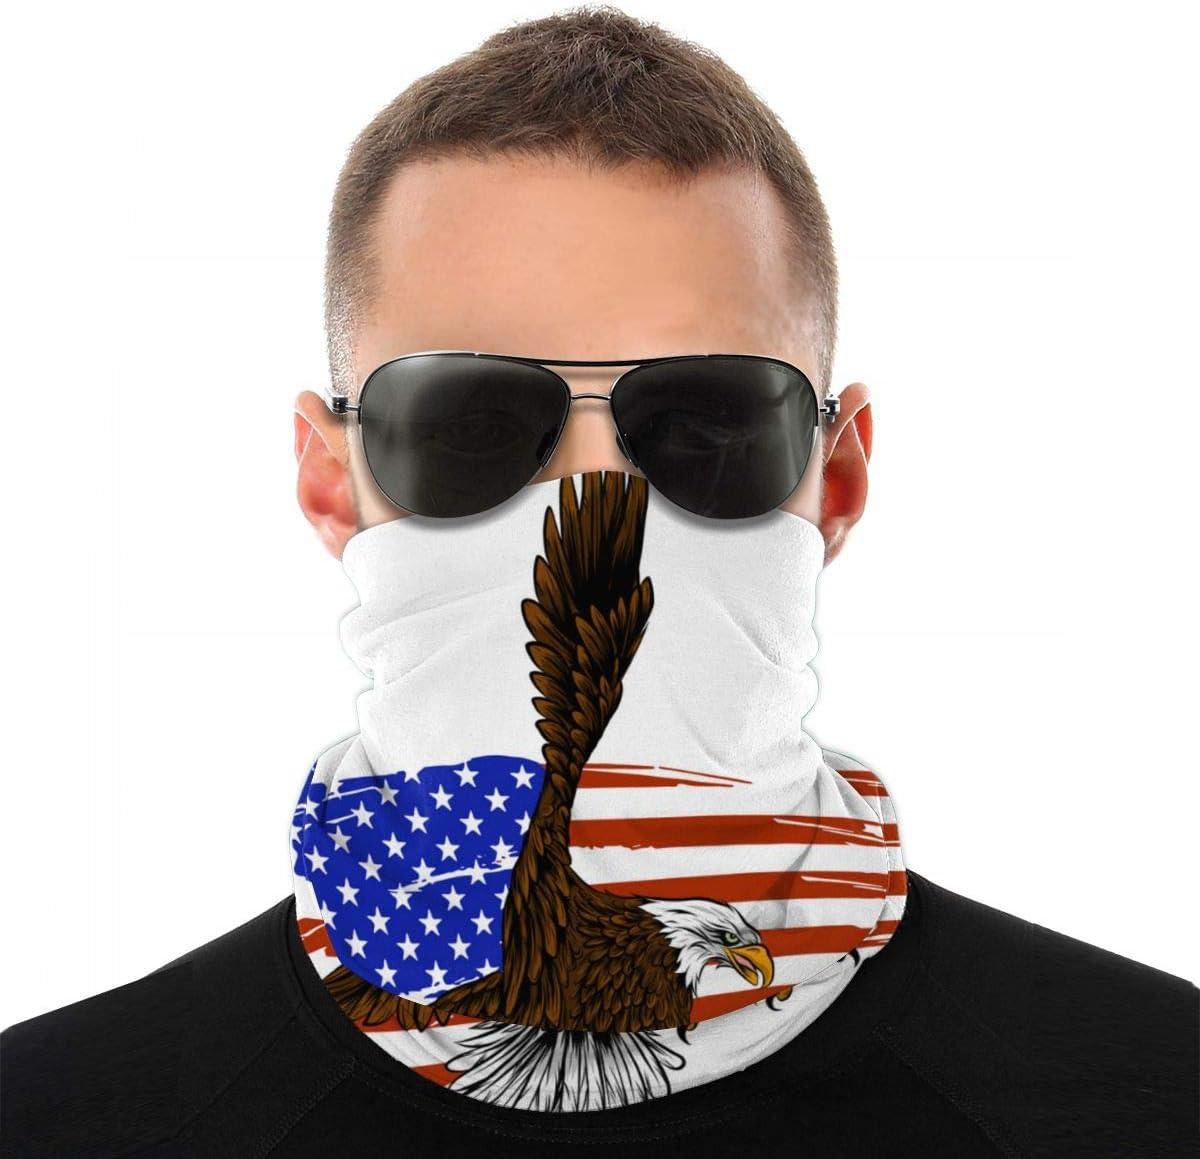 best pillow American Eagle contra la Bandera de Estados Unidos Pañuelos Cabeza Multifunción Bufanda Bandana,Bragas de Cabeza Turbante Magico Pasamontañas Tubo UV Pulsera Mascarilla para Hombre Mujer